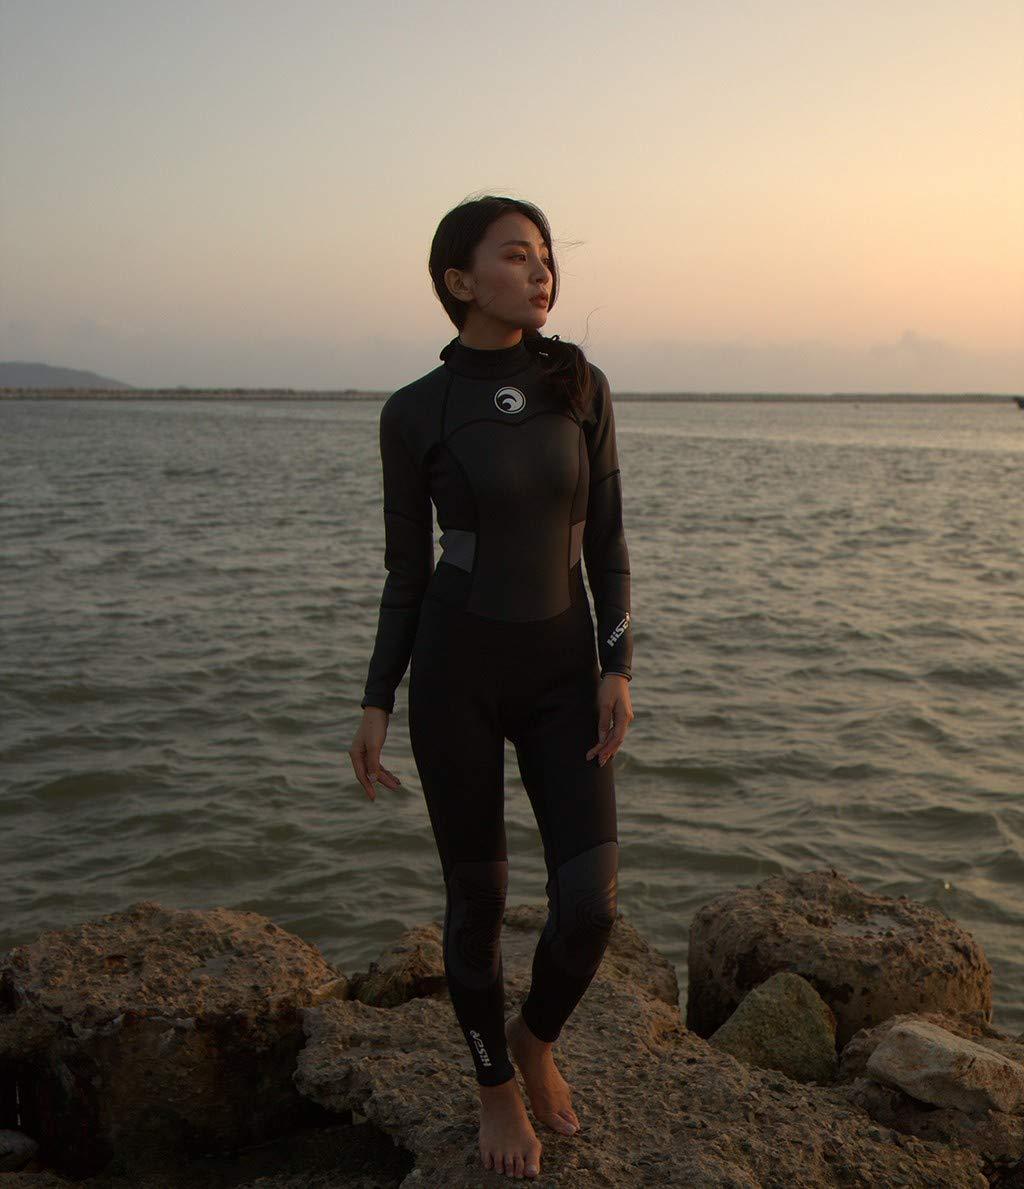 MILIMIEYIK Wetsuit Women, Womens Long Sleeve 1.5MM Neoprene Diving Jacket Front Zipper Wetsuit Top Warm Protection Black by MILIMIEYIK (Image #5)